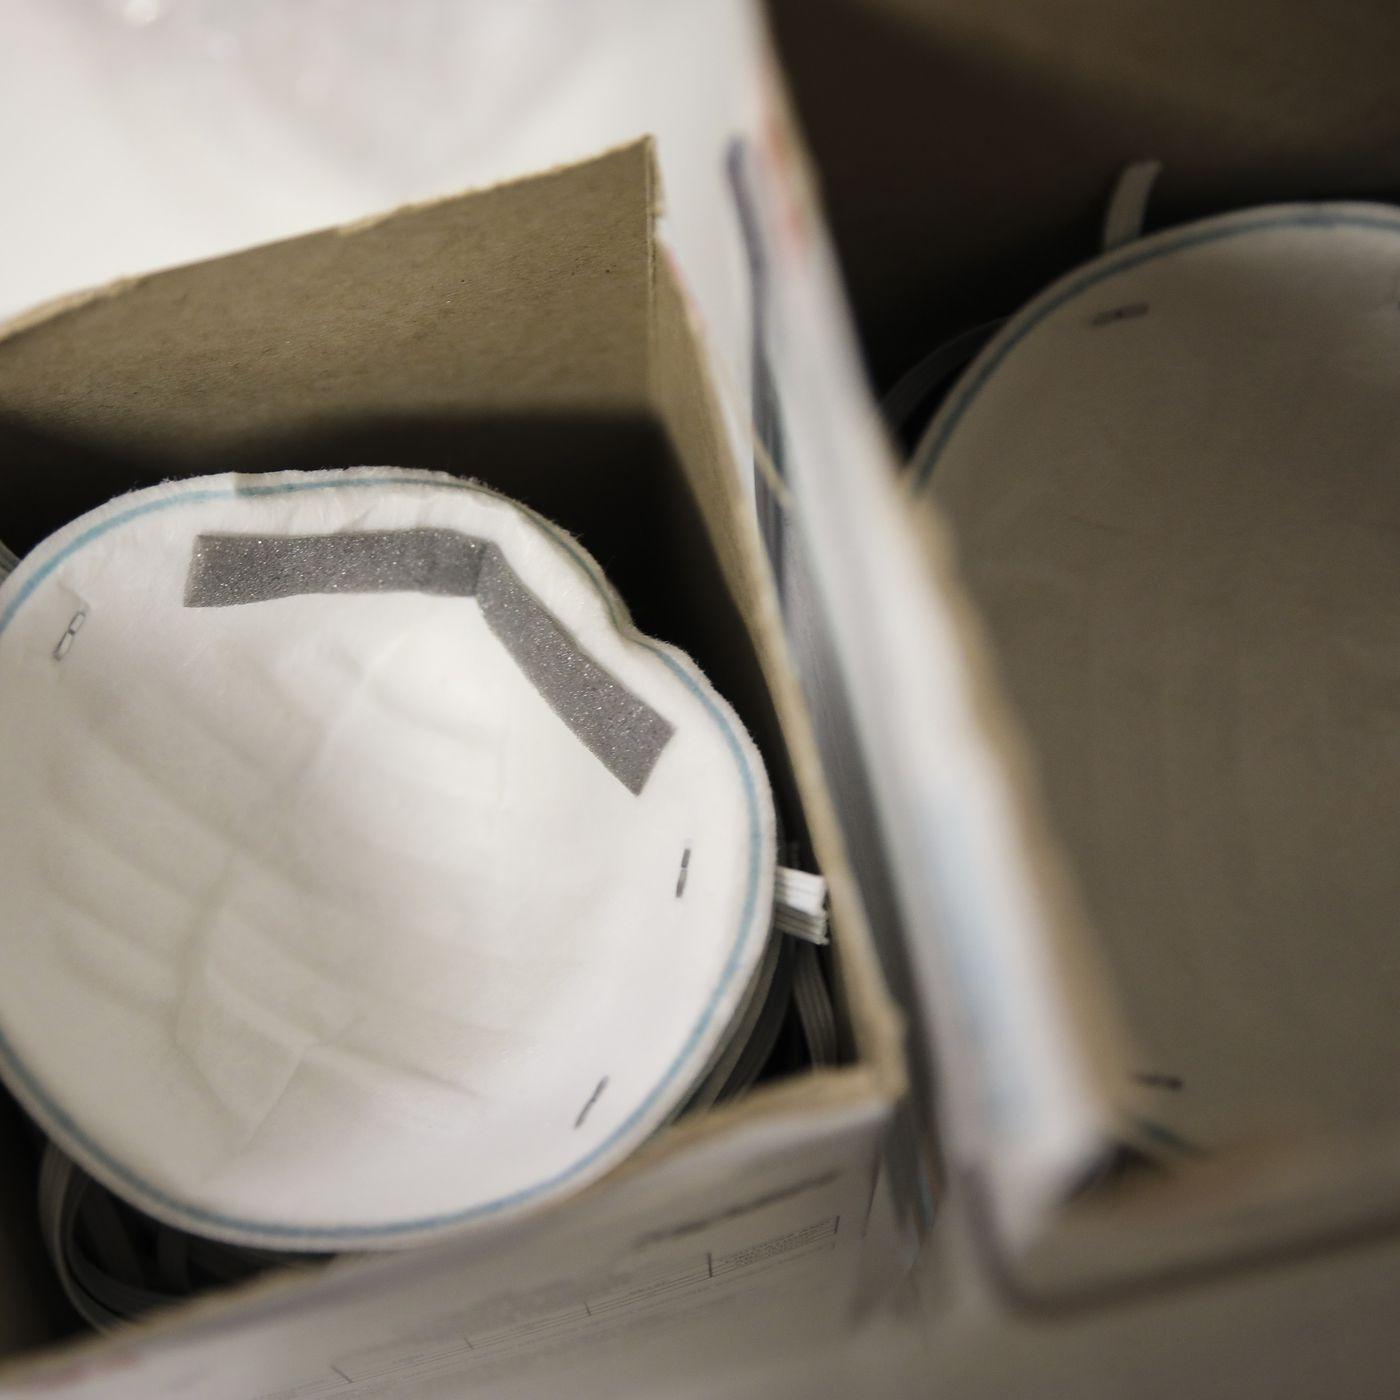 Coronavirus Pandemic Leads Amazon To Restrict N95 Mask Sales Vox